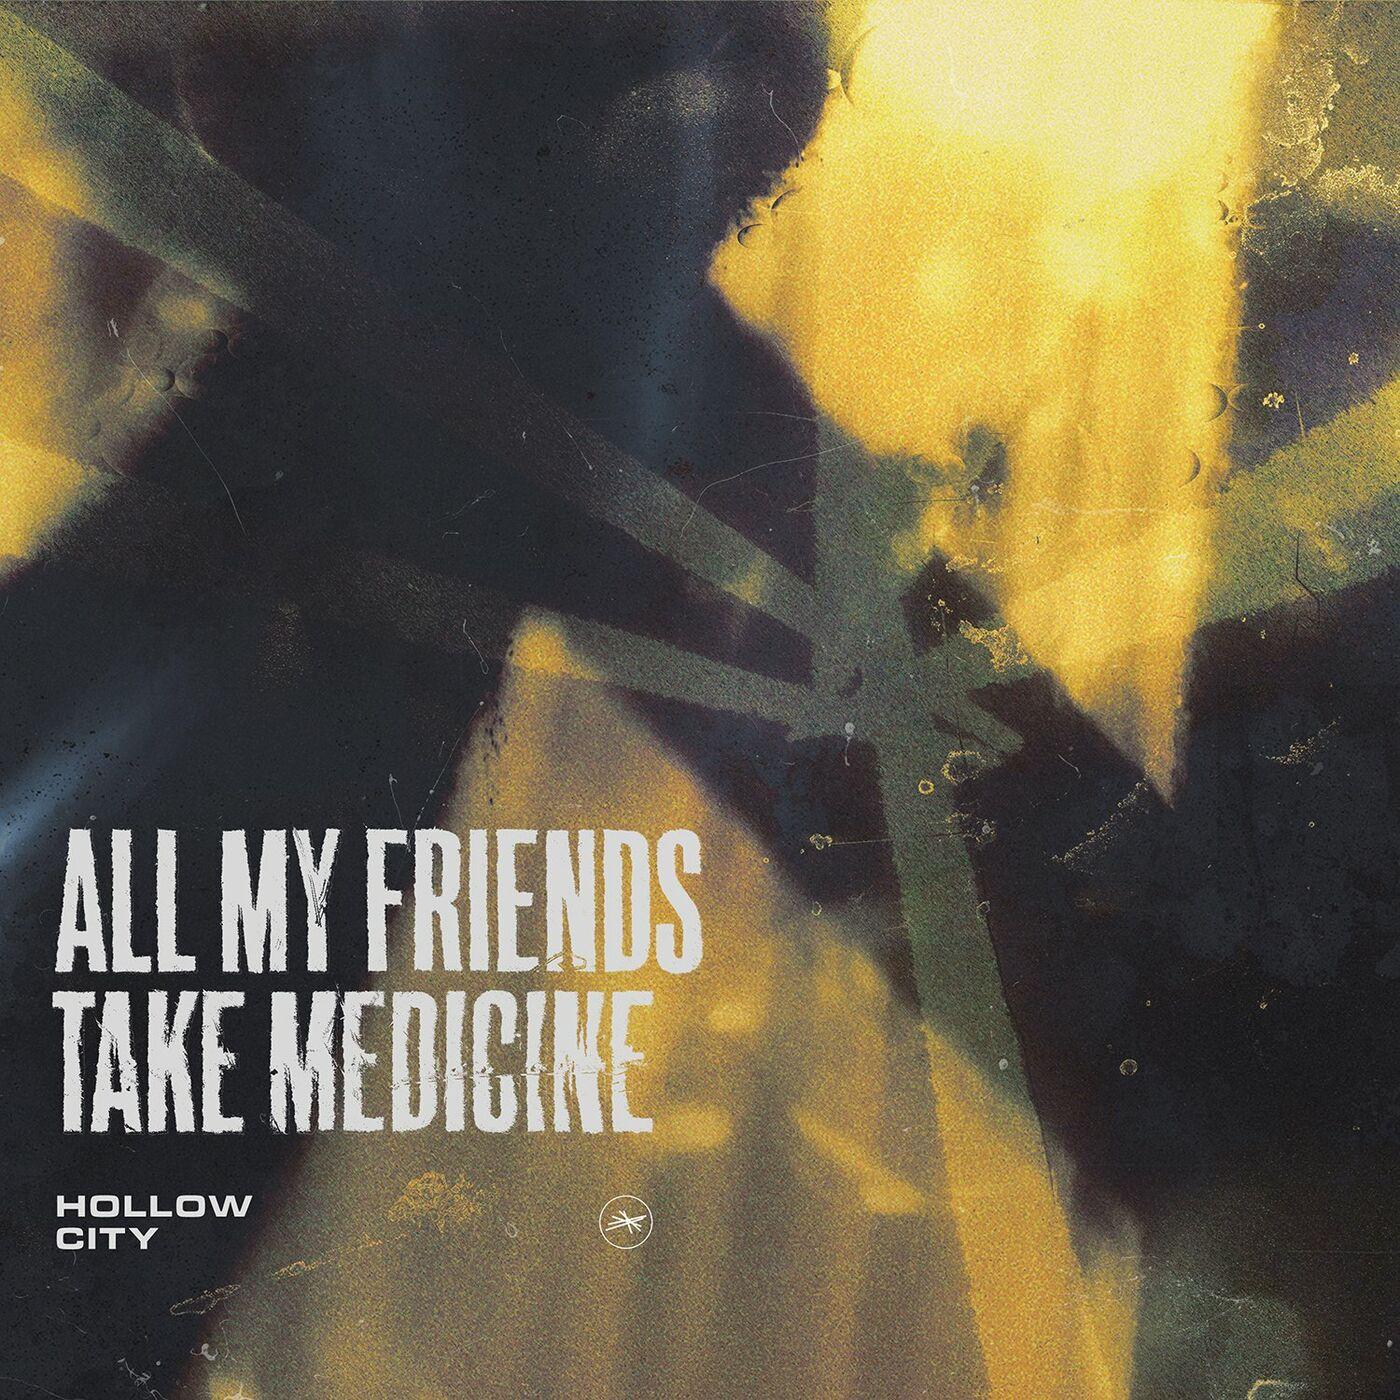 Hollow City - All My Friends Take Medicine [single] (2021)